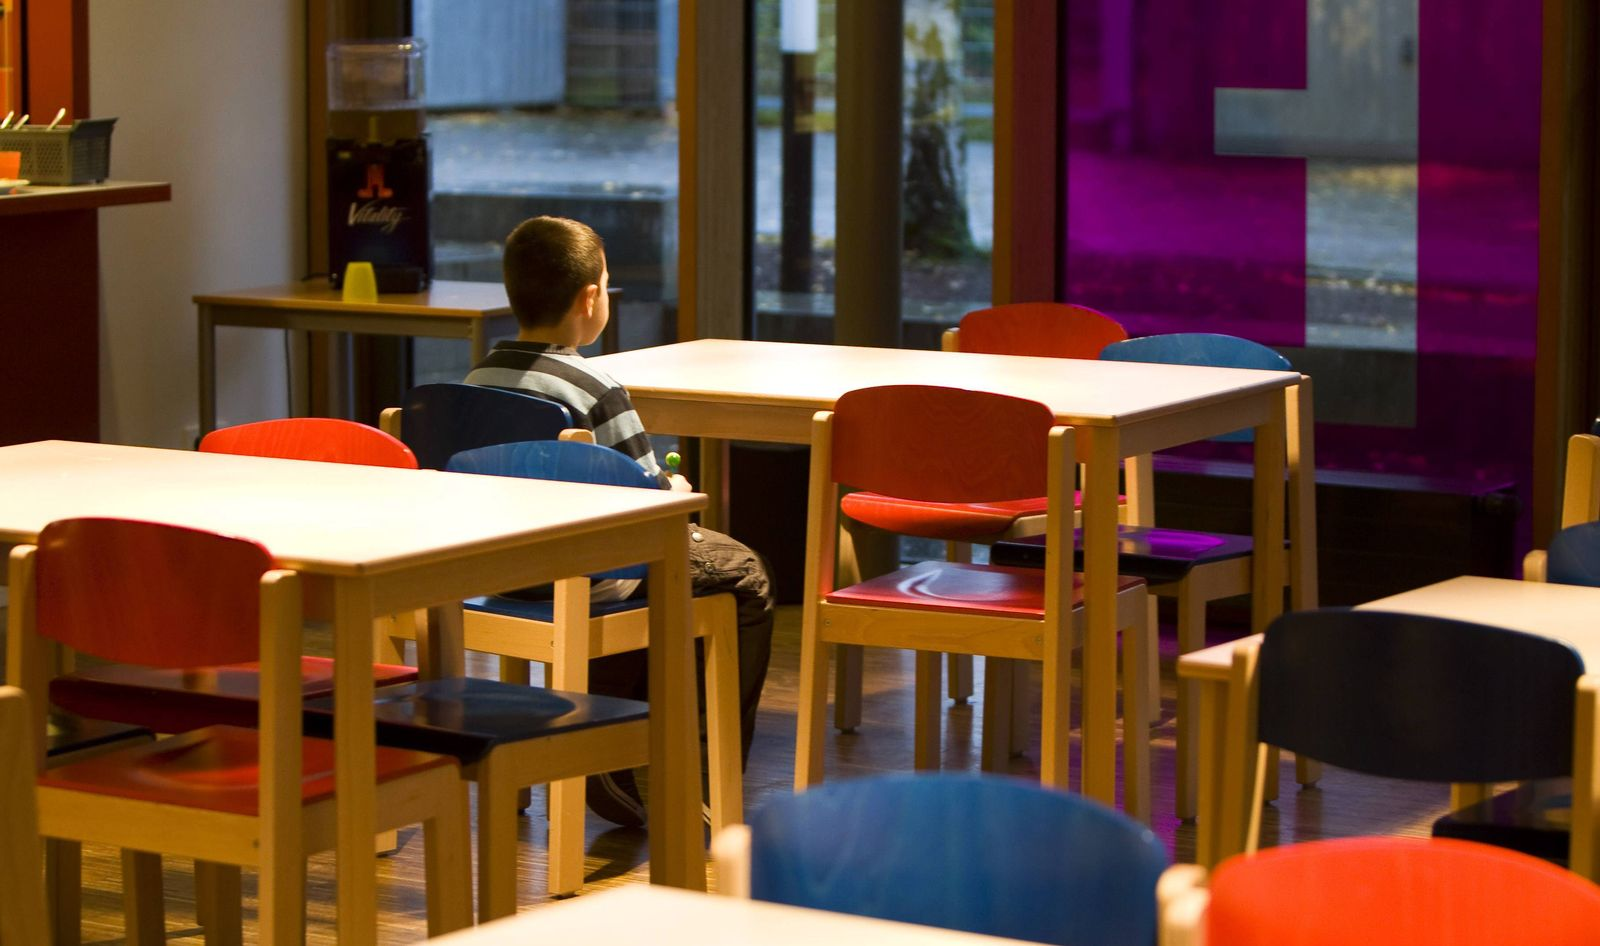 EINMALIGE VERWENDUNG Armut / Kinderarmut / Kinderclub Die Arche